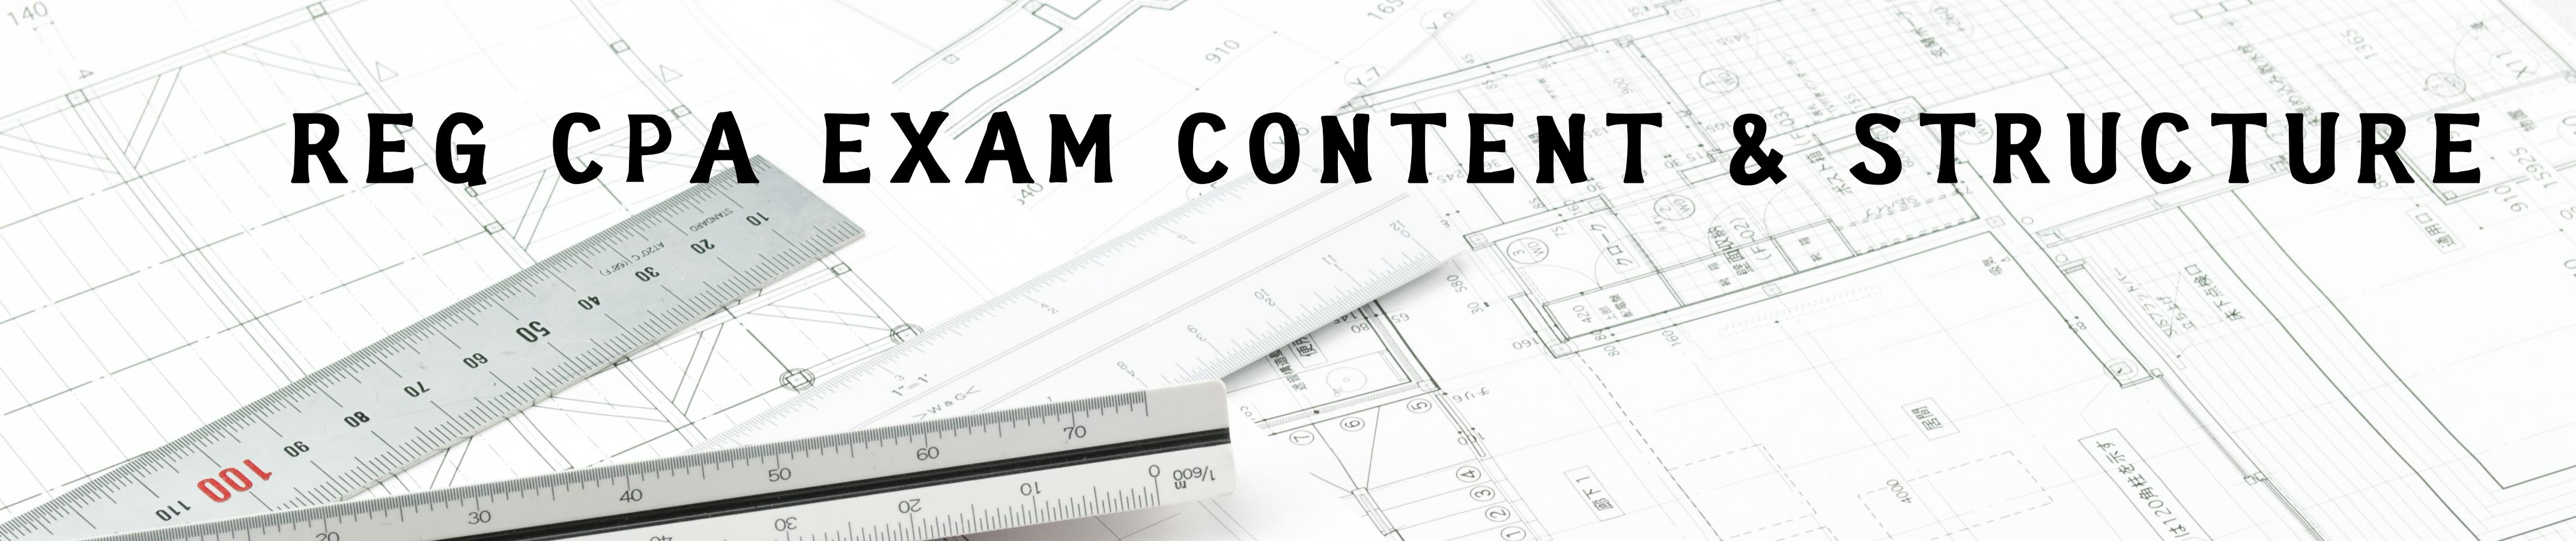 REG CPA Exam Content & Structure